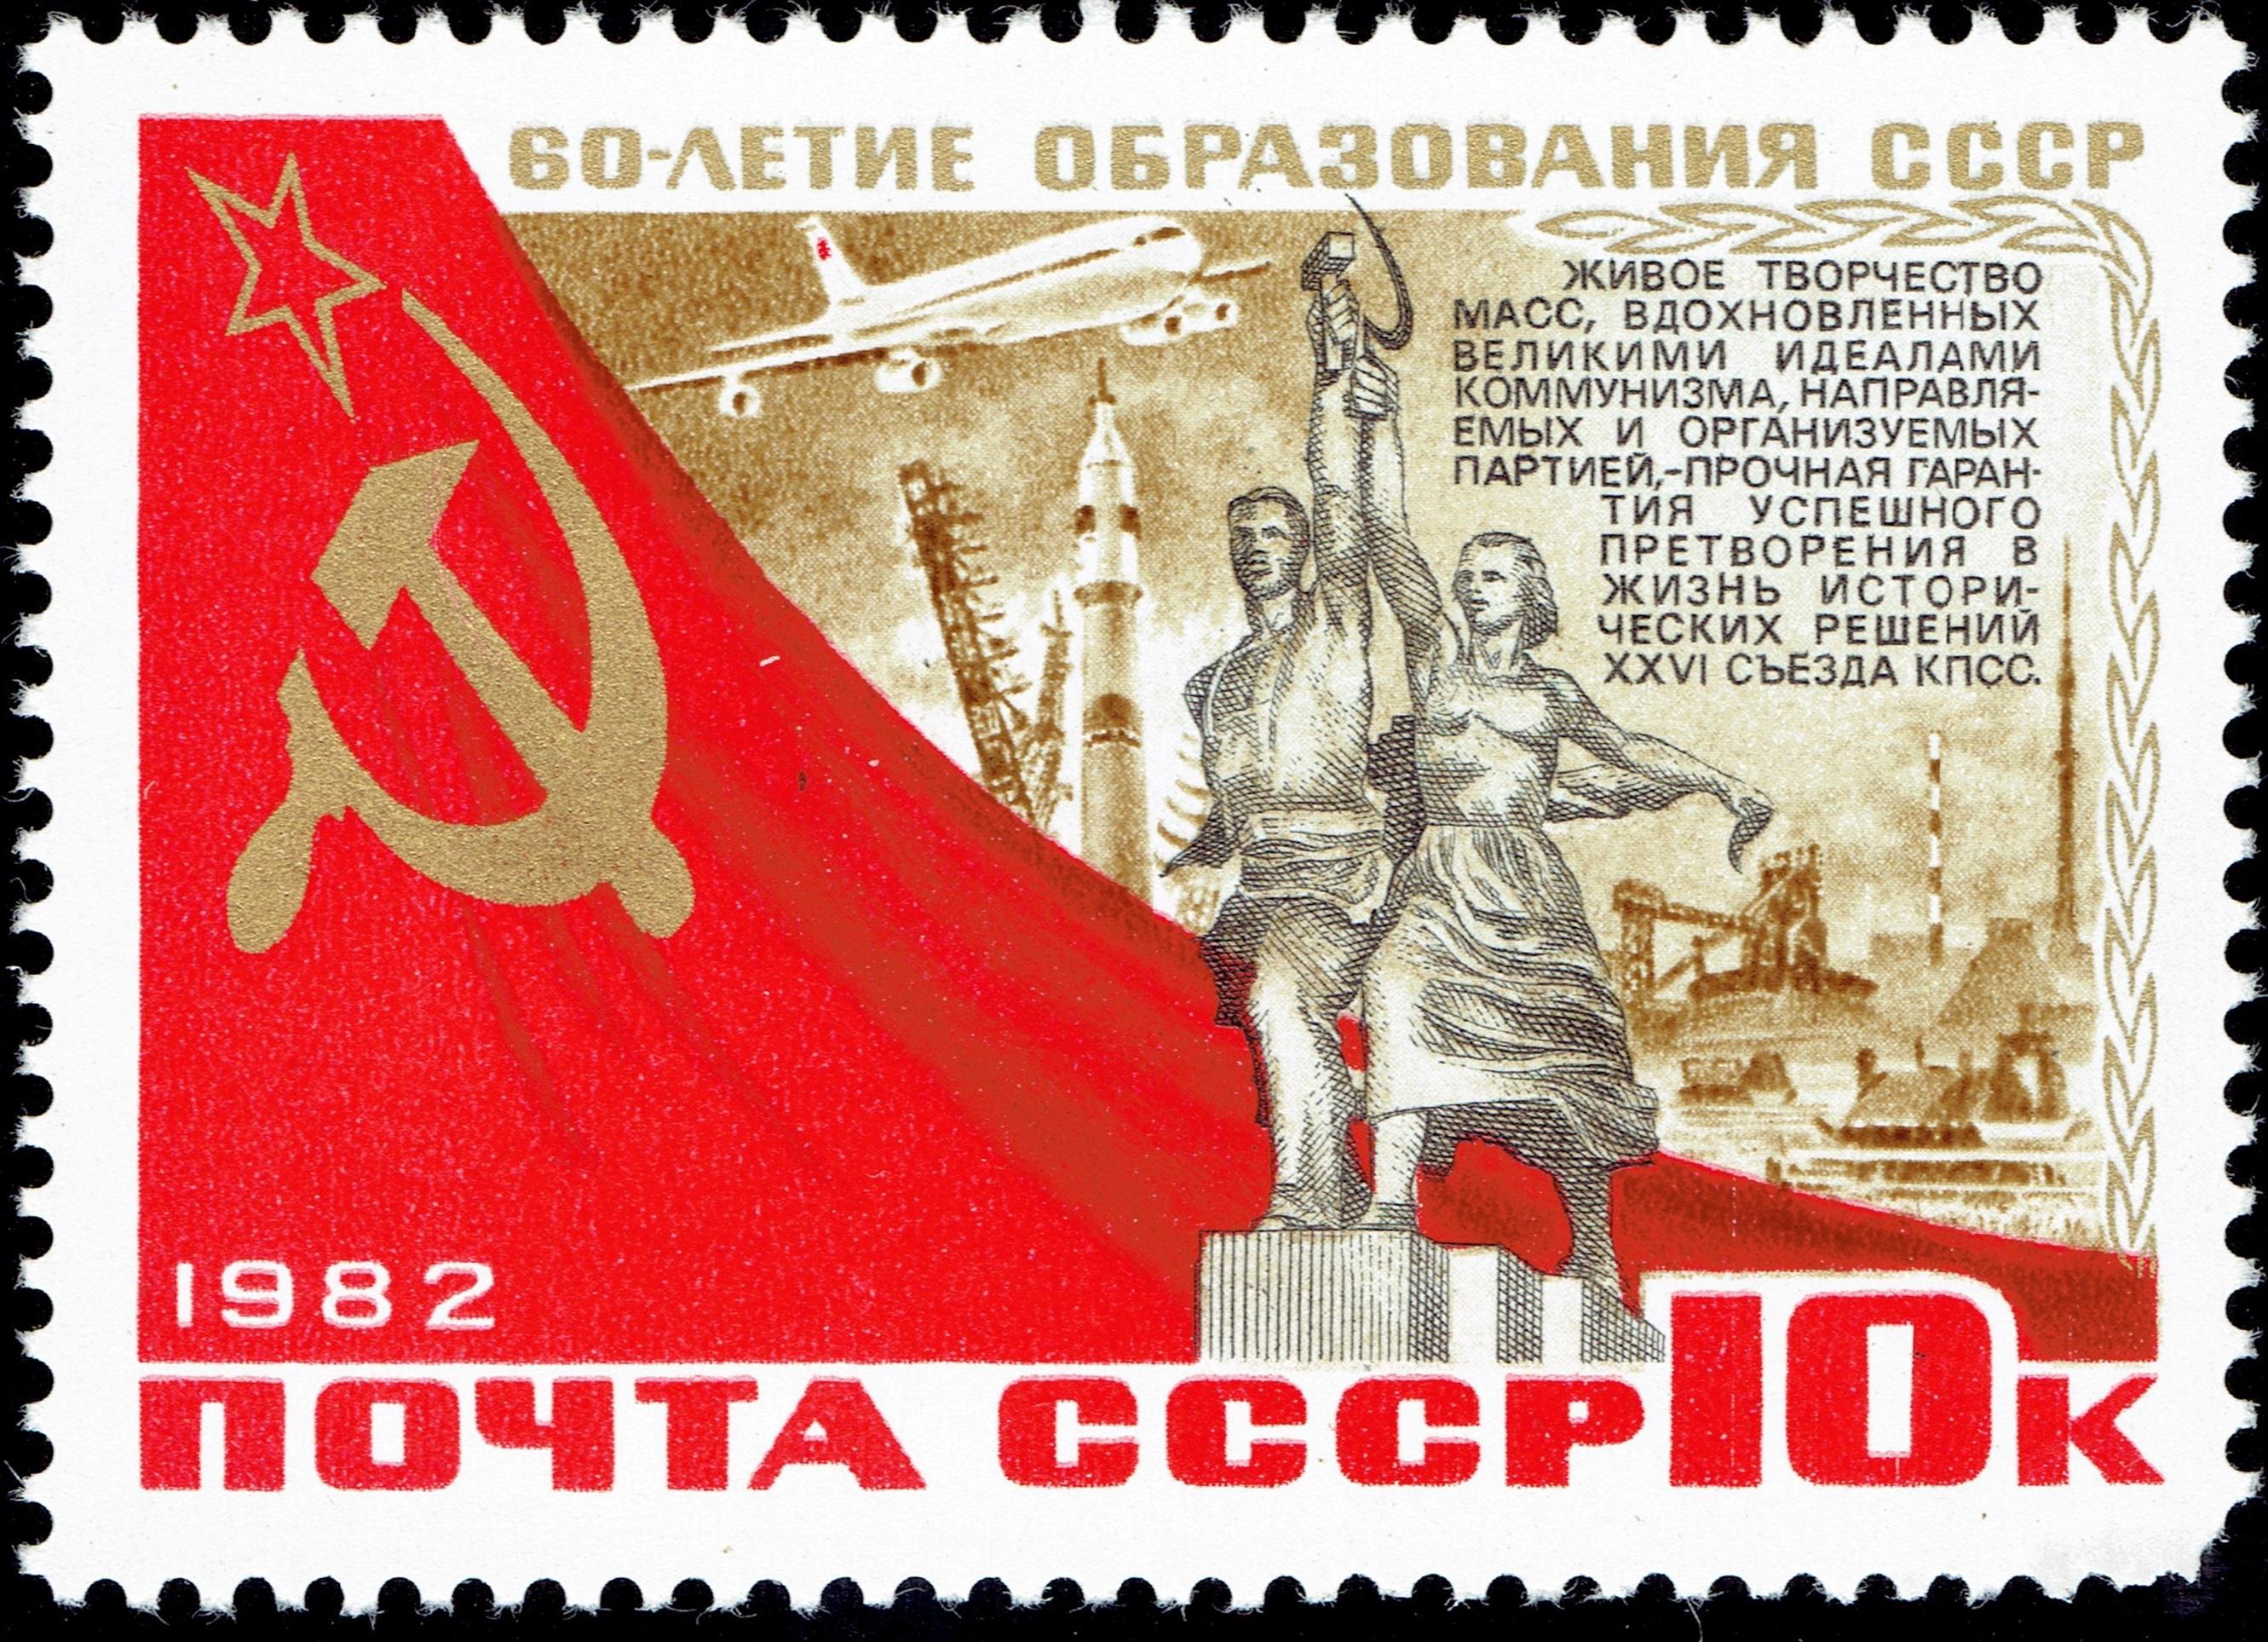 Union of Soviet Socialist Republics - Scott #5095 (1982): Workers' Monument in Moscow, rocket, jet plane